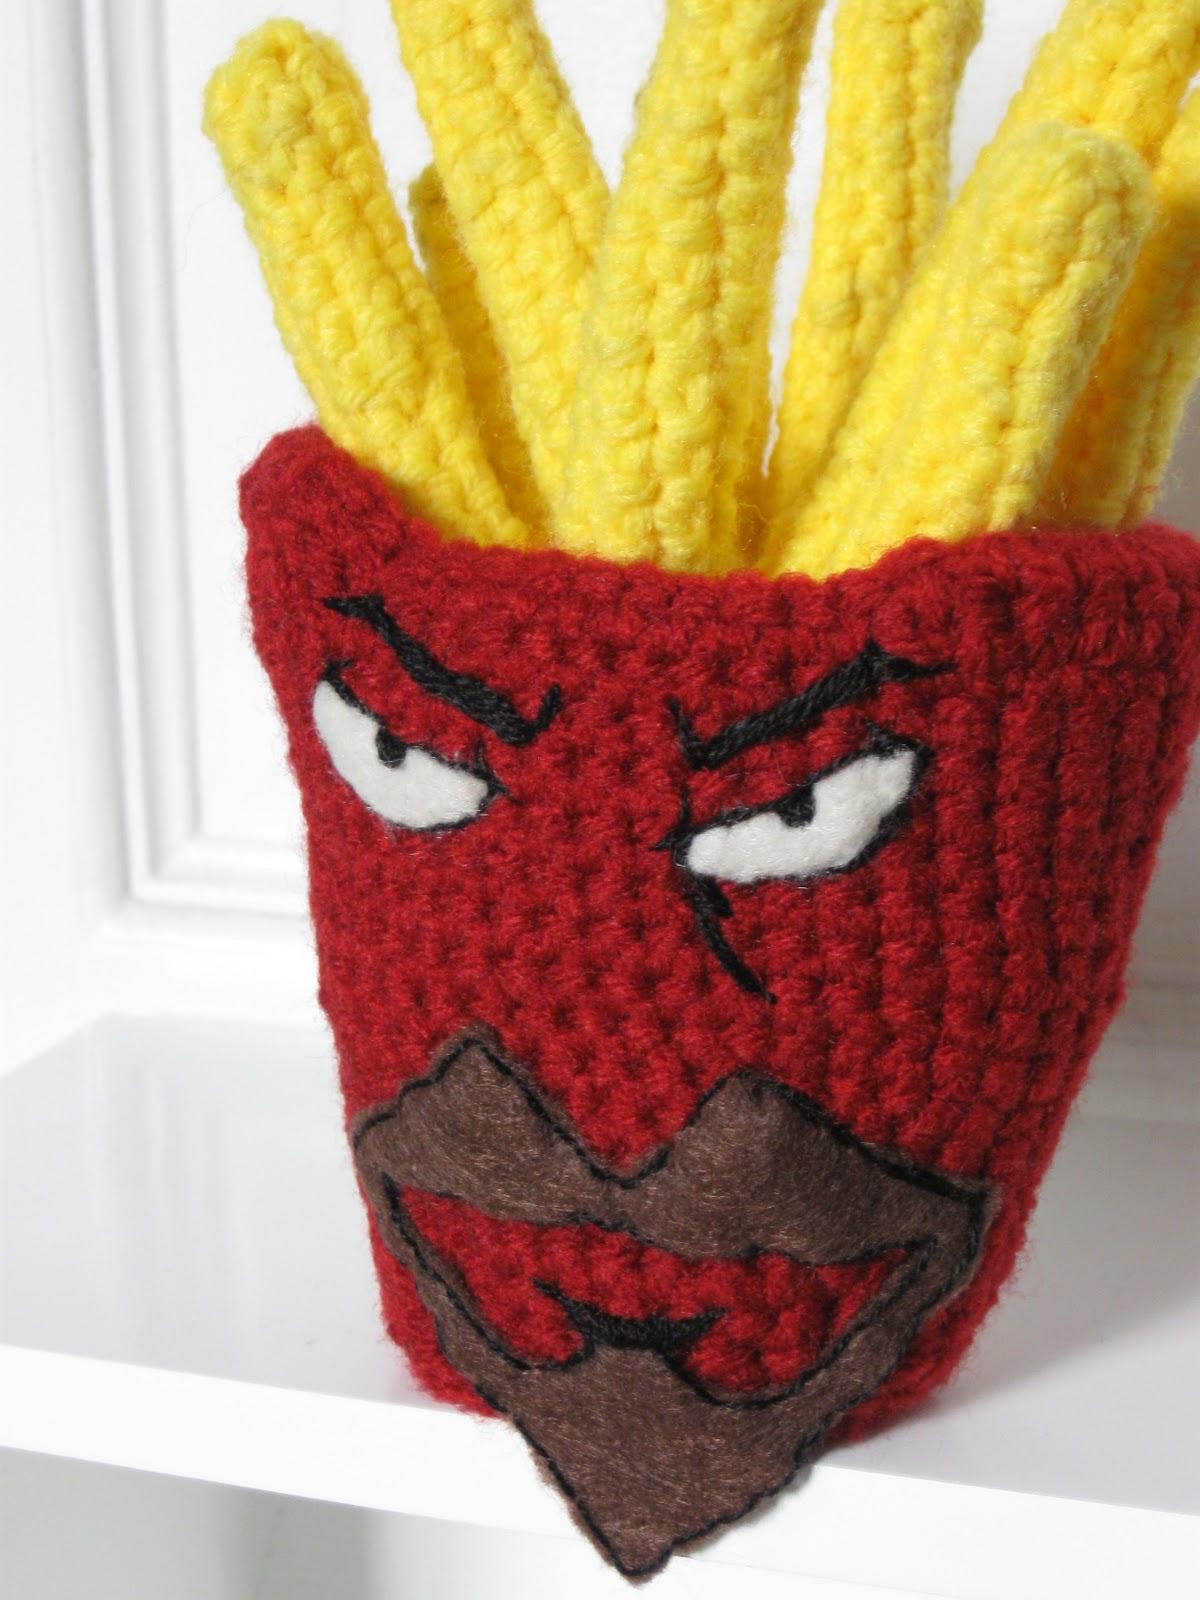 Mostly Nerdy Crochet: Frylock with Free Pattern!